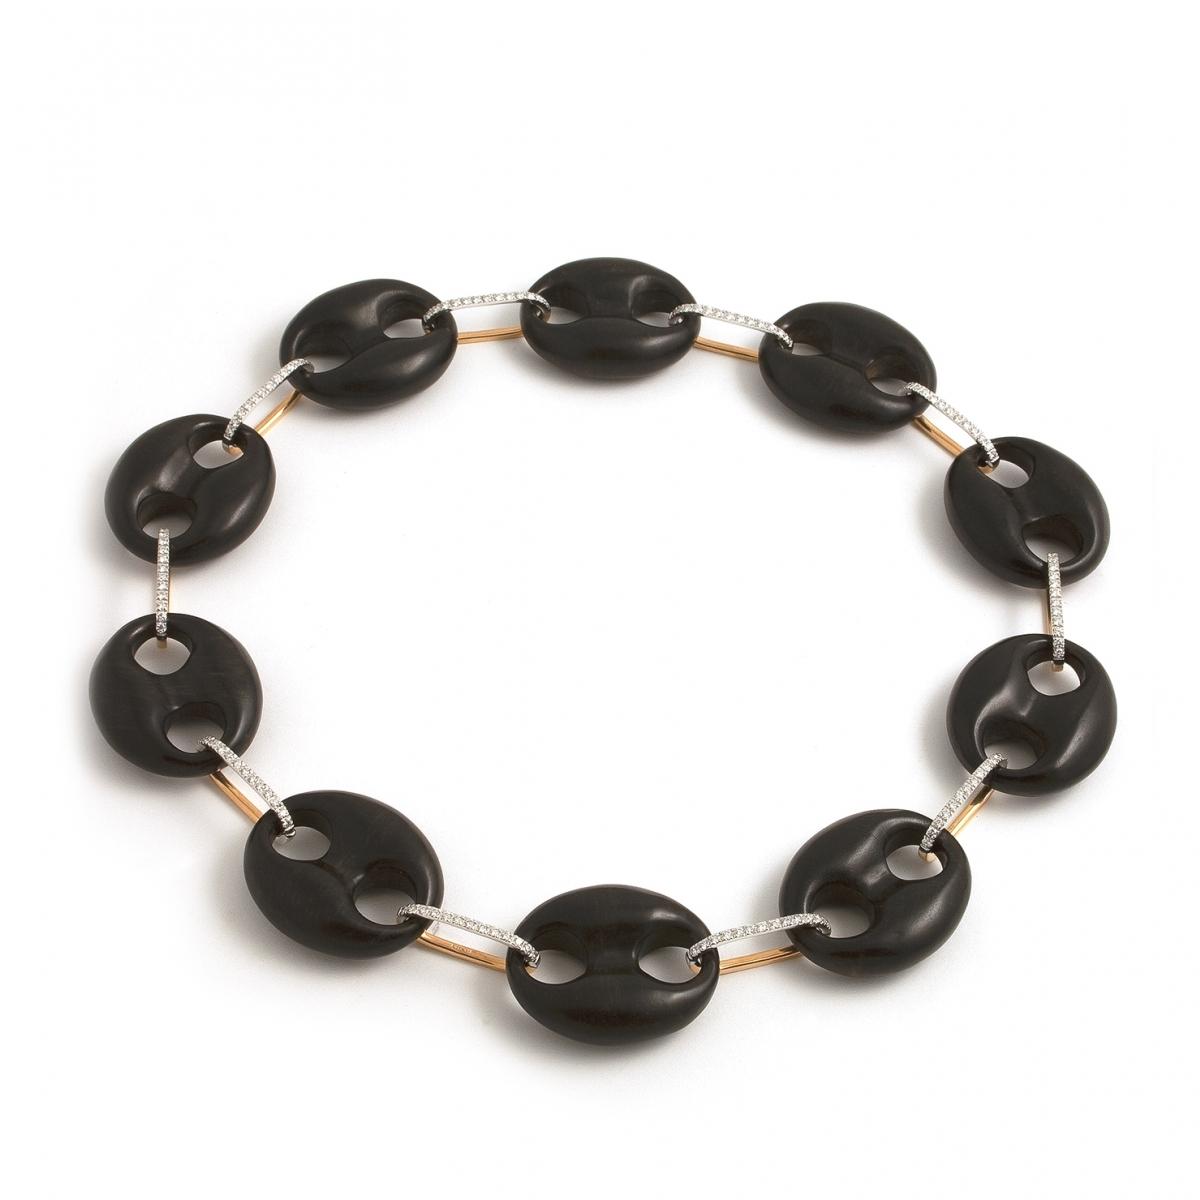 Maglie Marine necklace